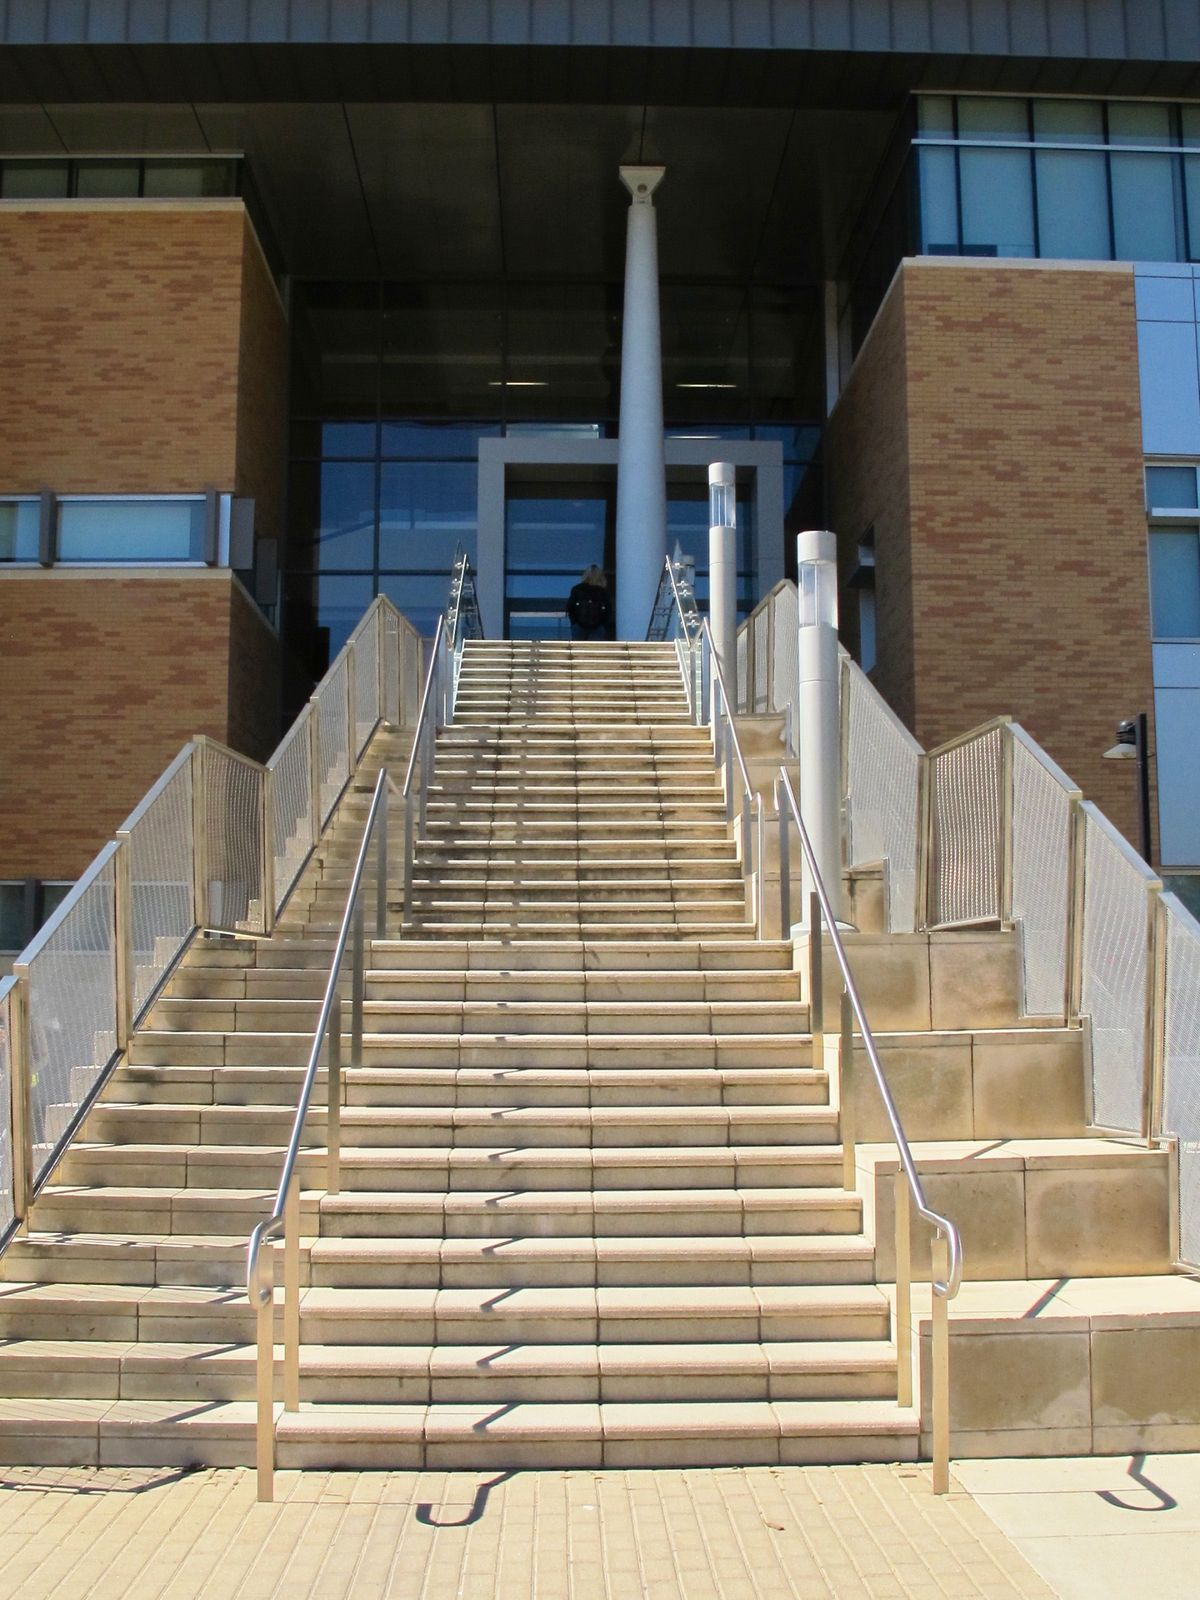 University of North Texas Schools Photo Video Shoot Location24.jpg